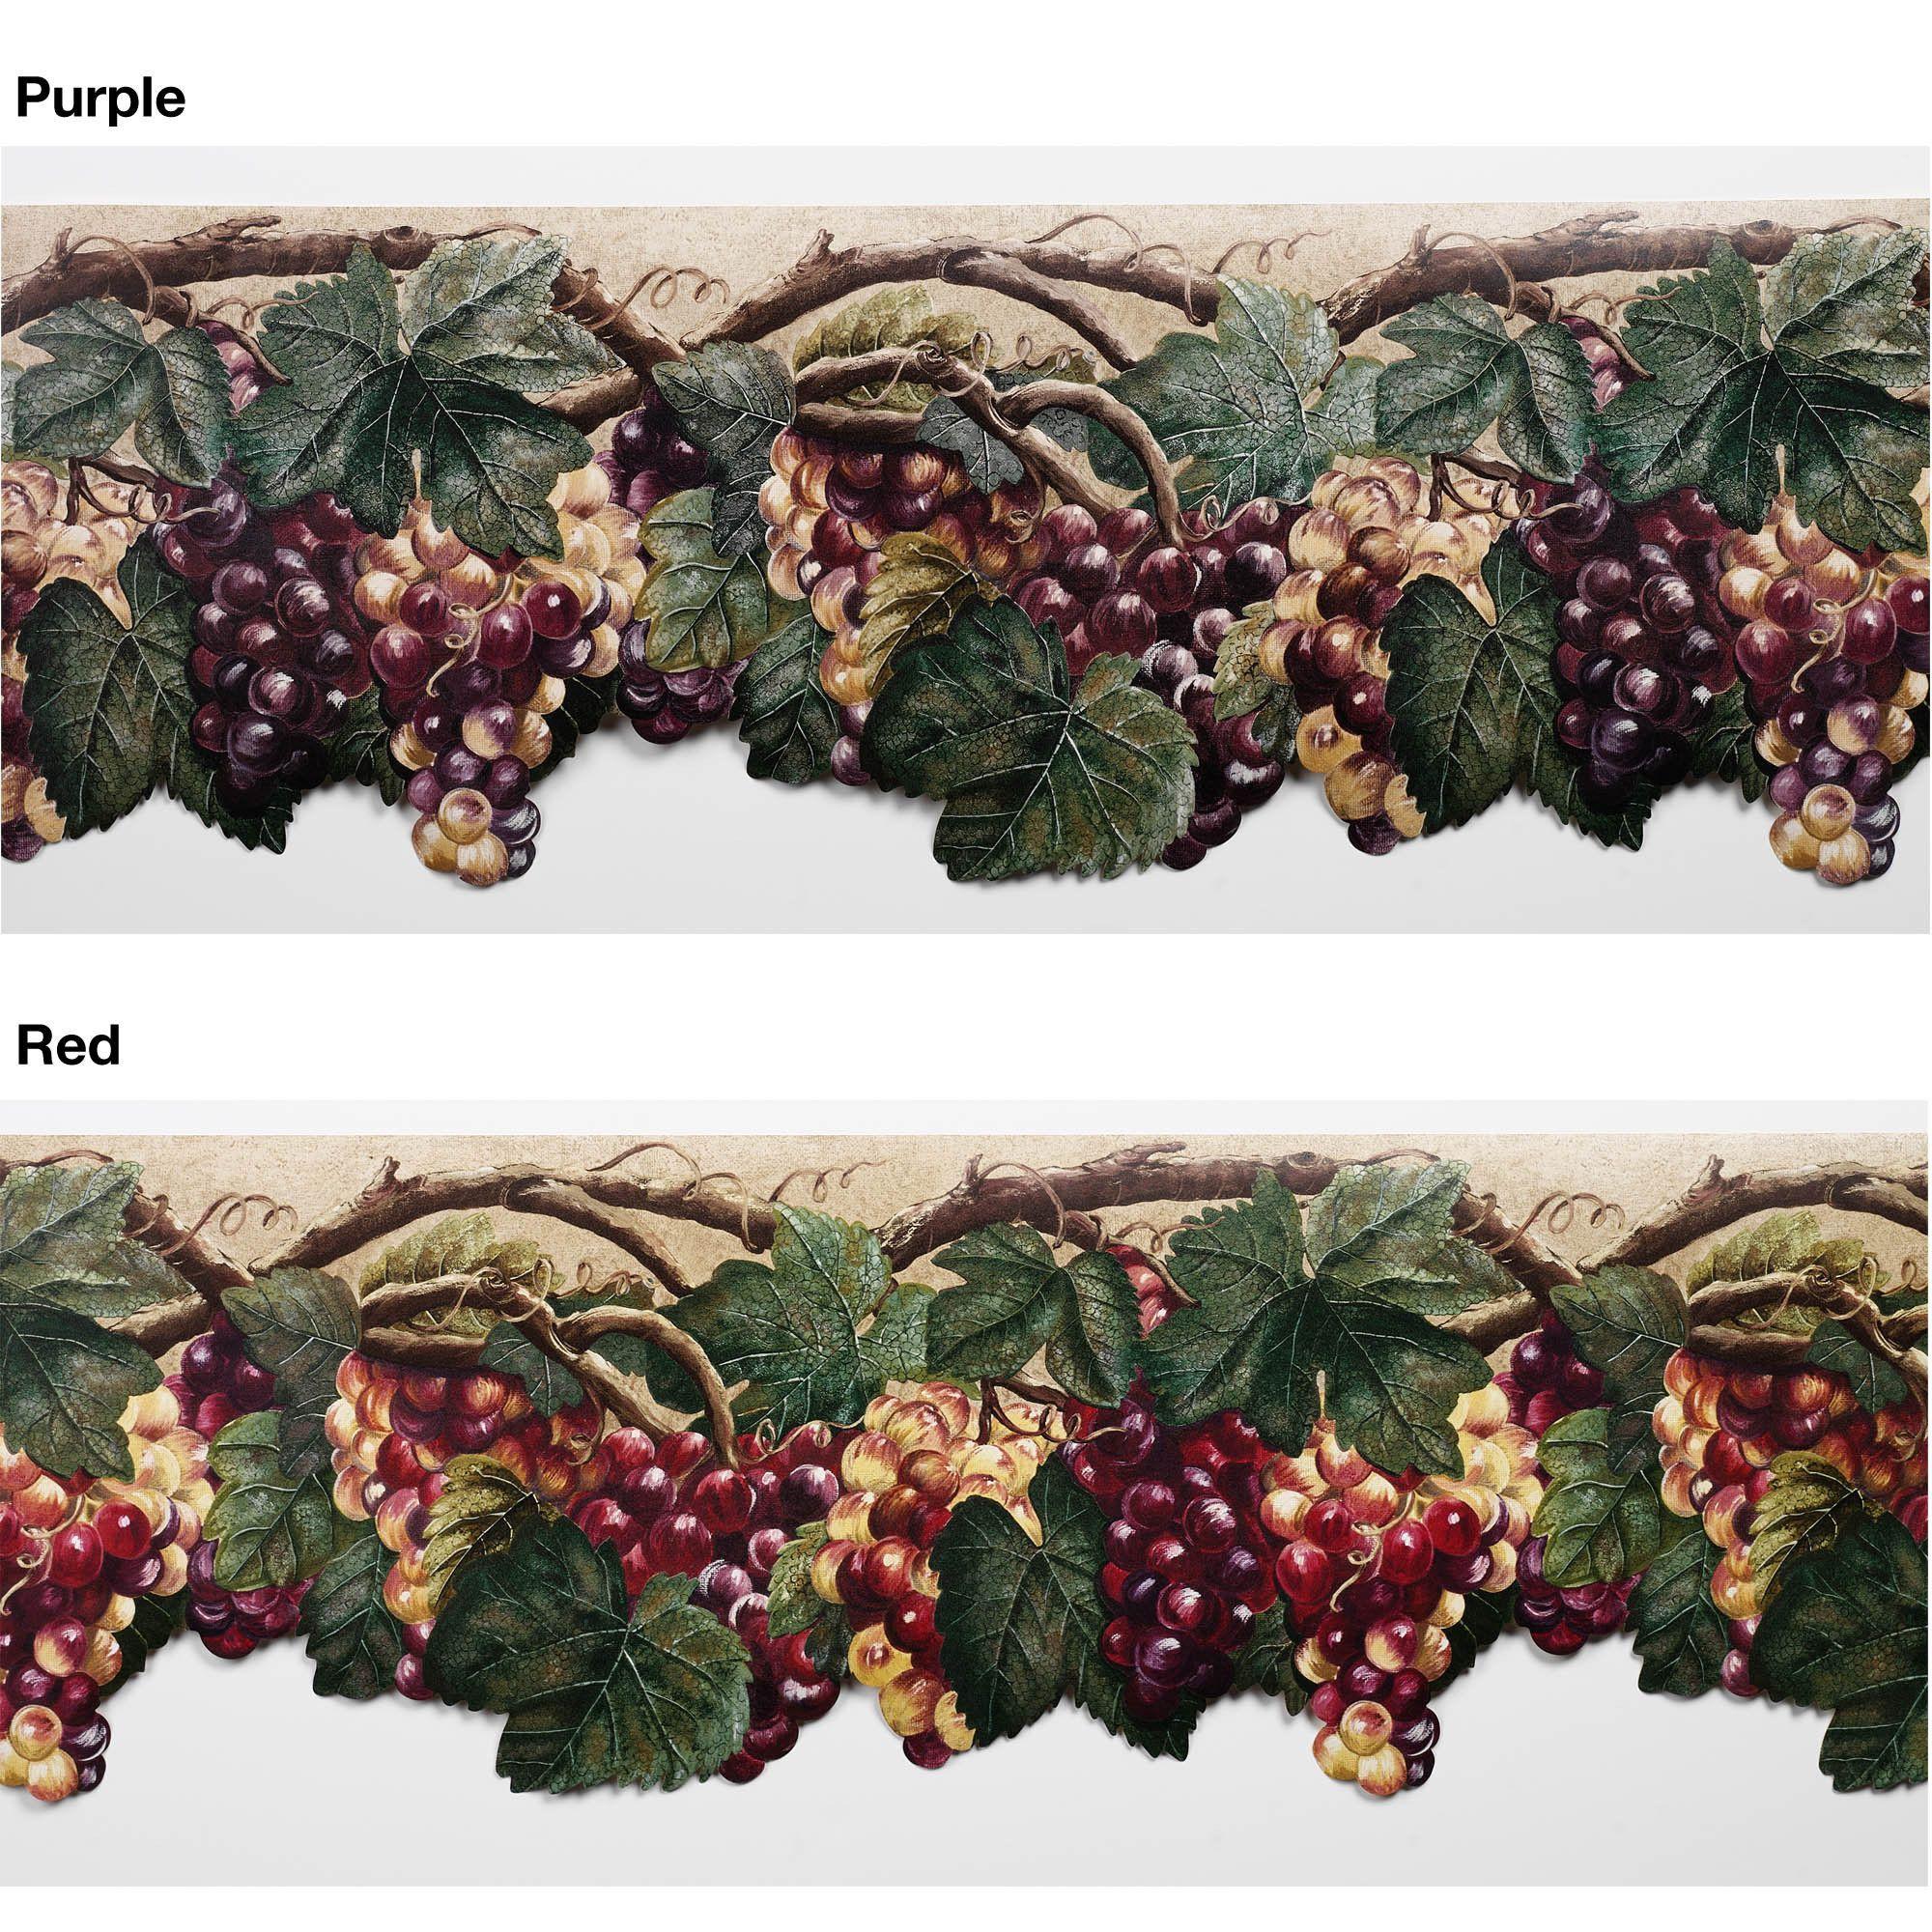 Wallpaper Border Tuscan Grape Leaves Purple Grapes Grape Wallpaper Fruit Wallpaper Grape Decor